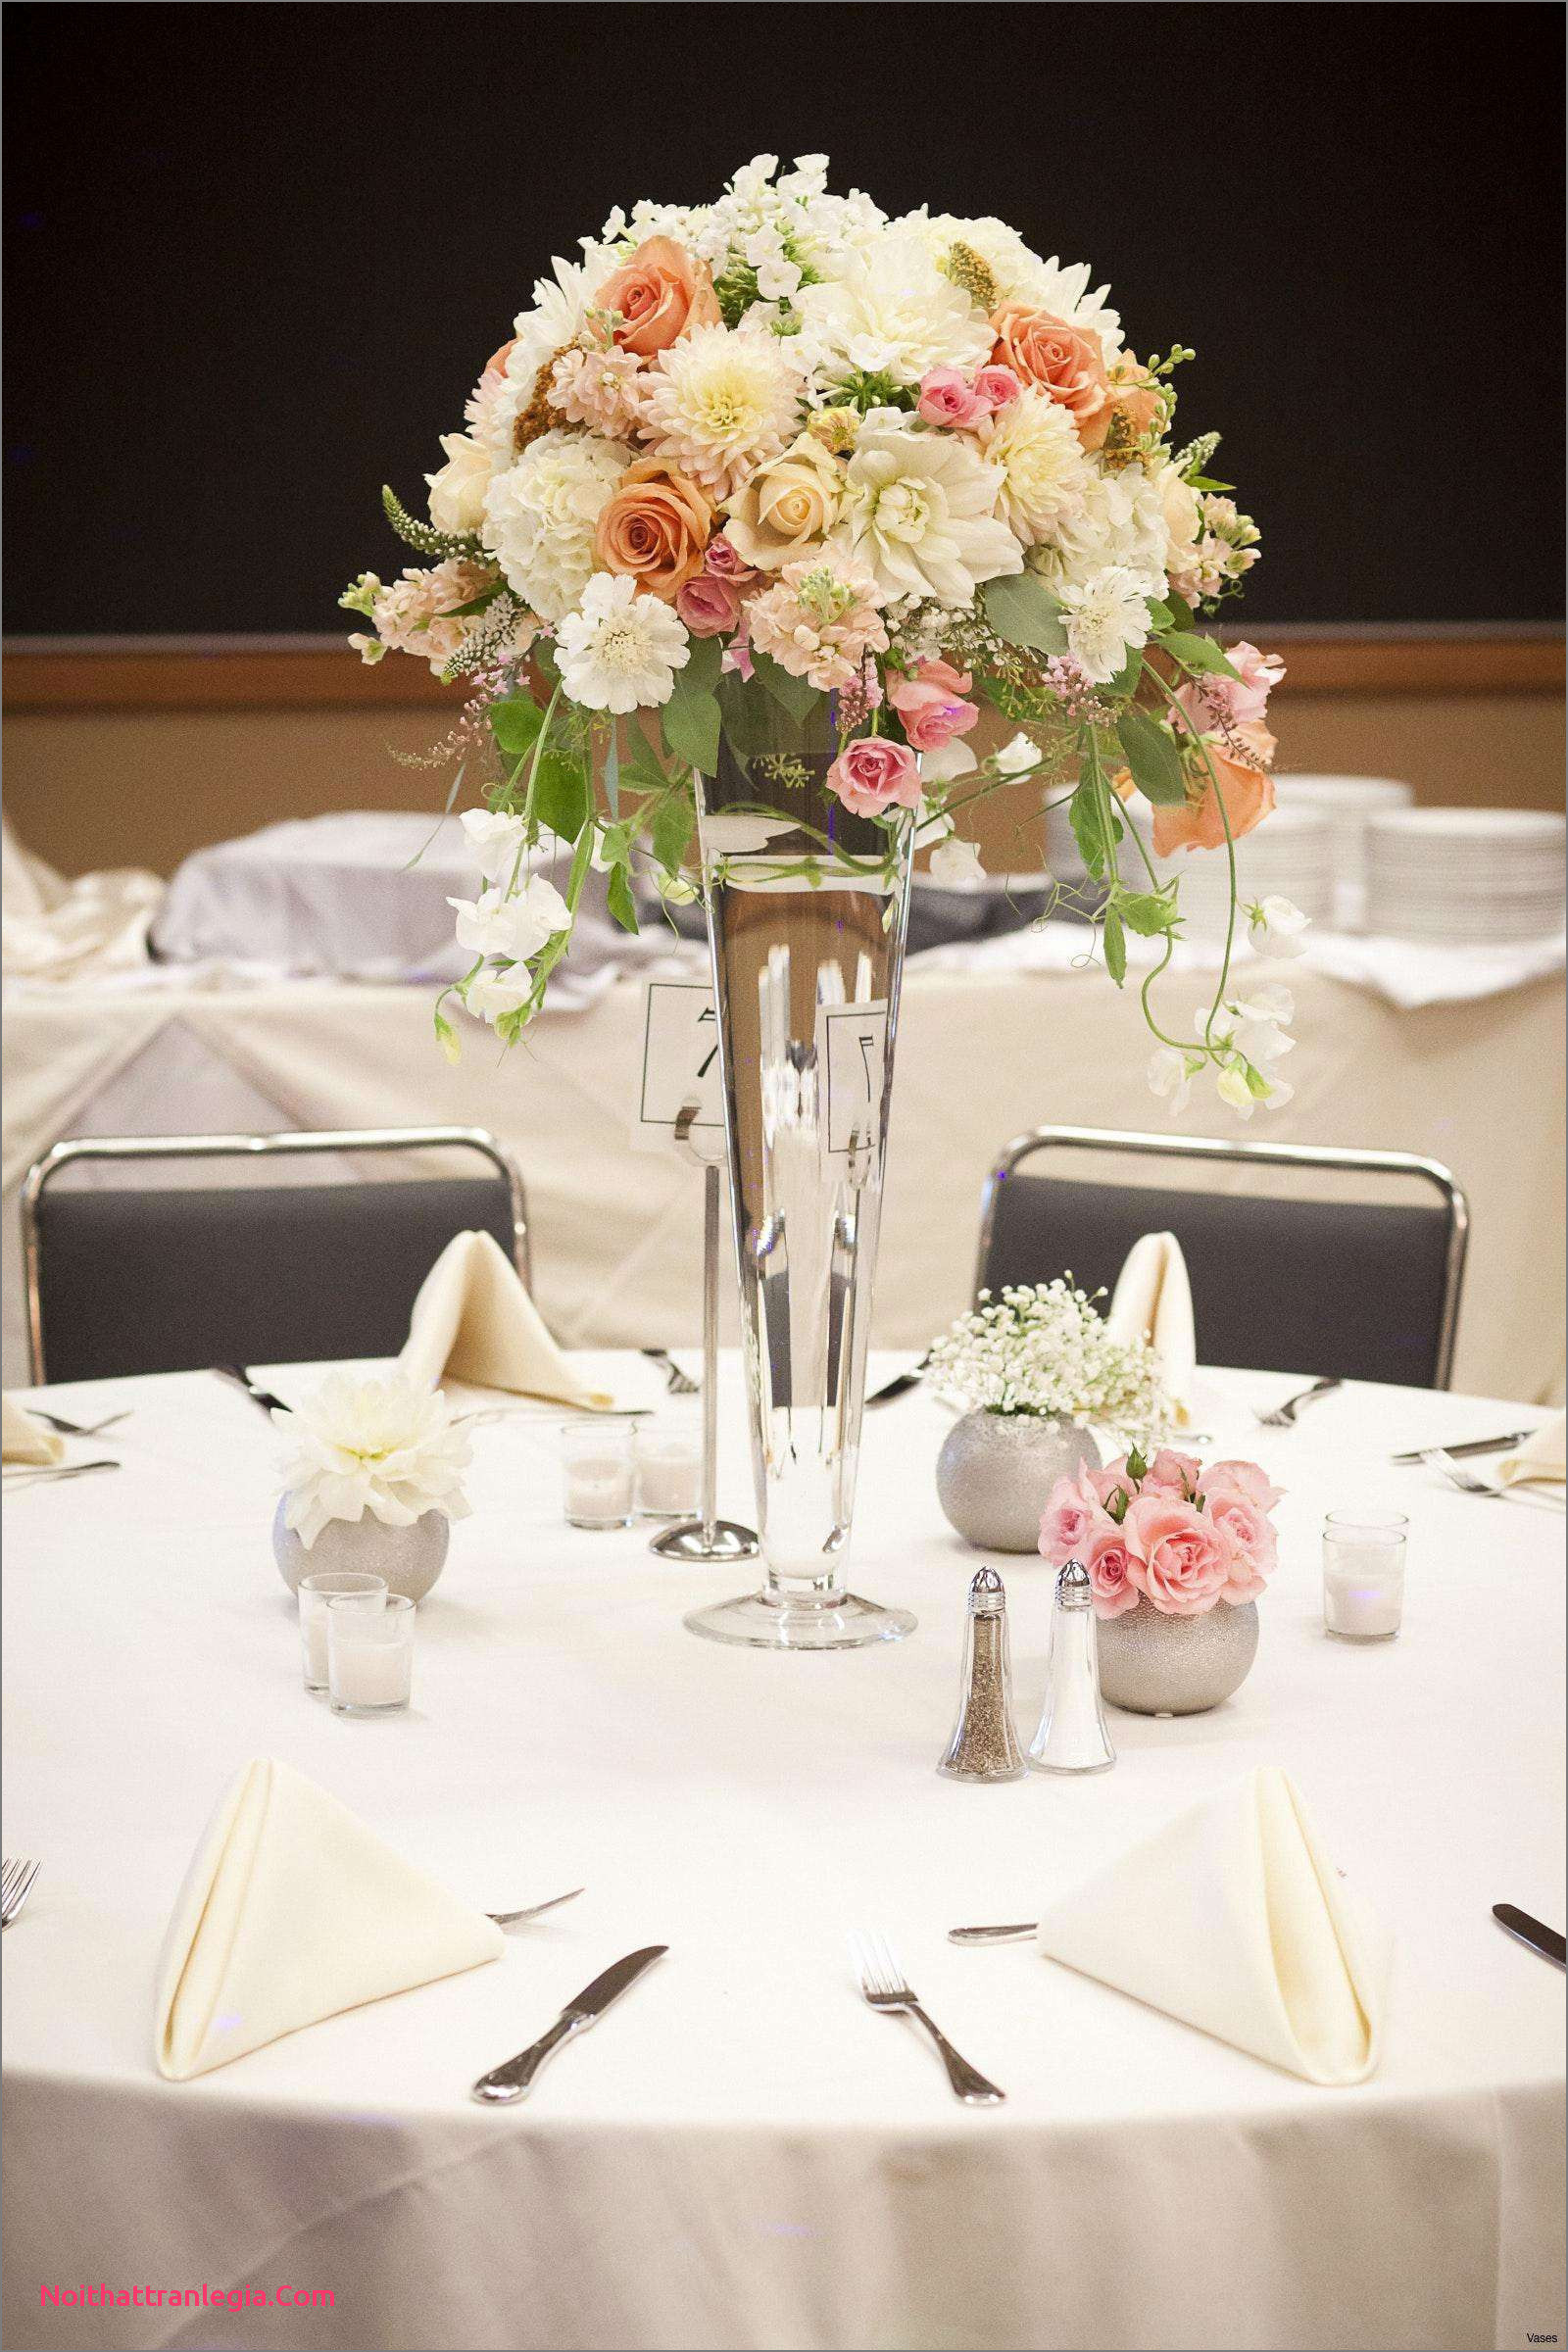 wedding table flower vases of 20 wedding vases noithattranlegia vases design throughout living room vases wedding inspirational h vases candy vase i 0d